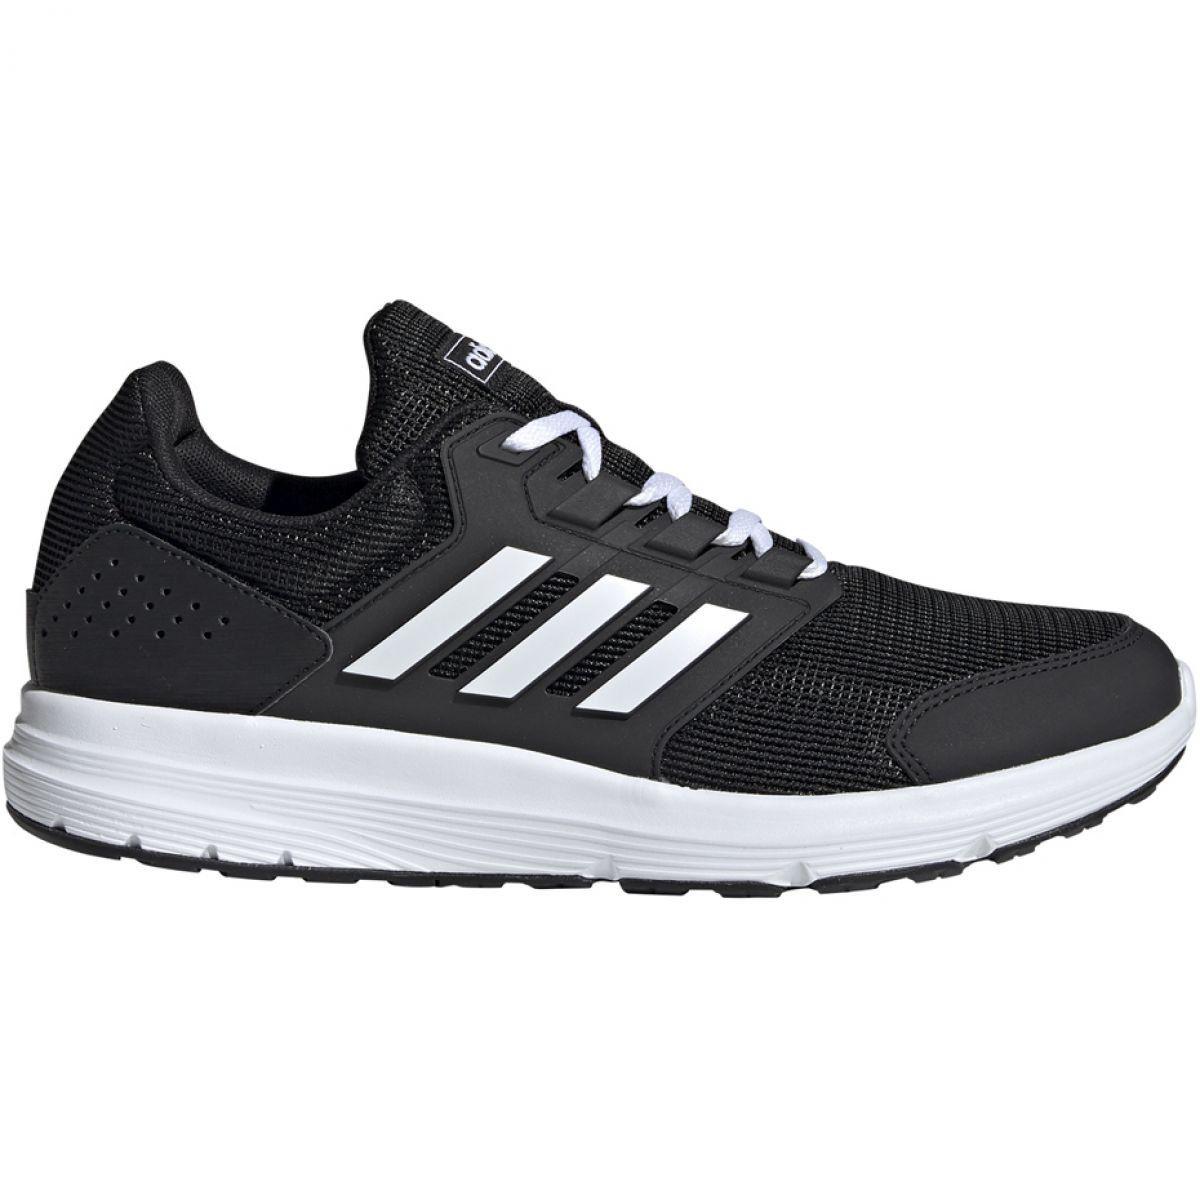 Buty Meskie Do Biegania Adidas Galaxy 4 M Ee8024 Czarne Running Shoes For Men Adidas Running Shoes Adidas Shoes